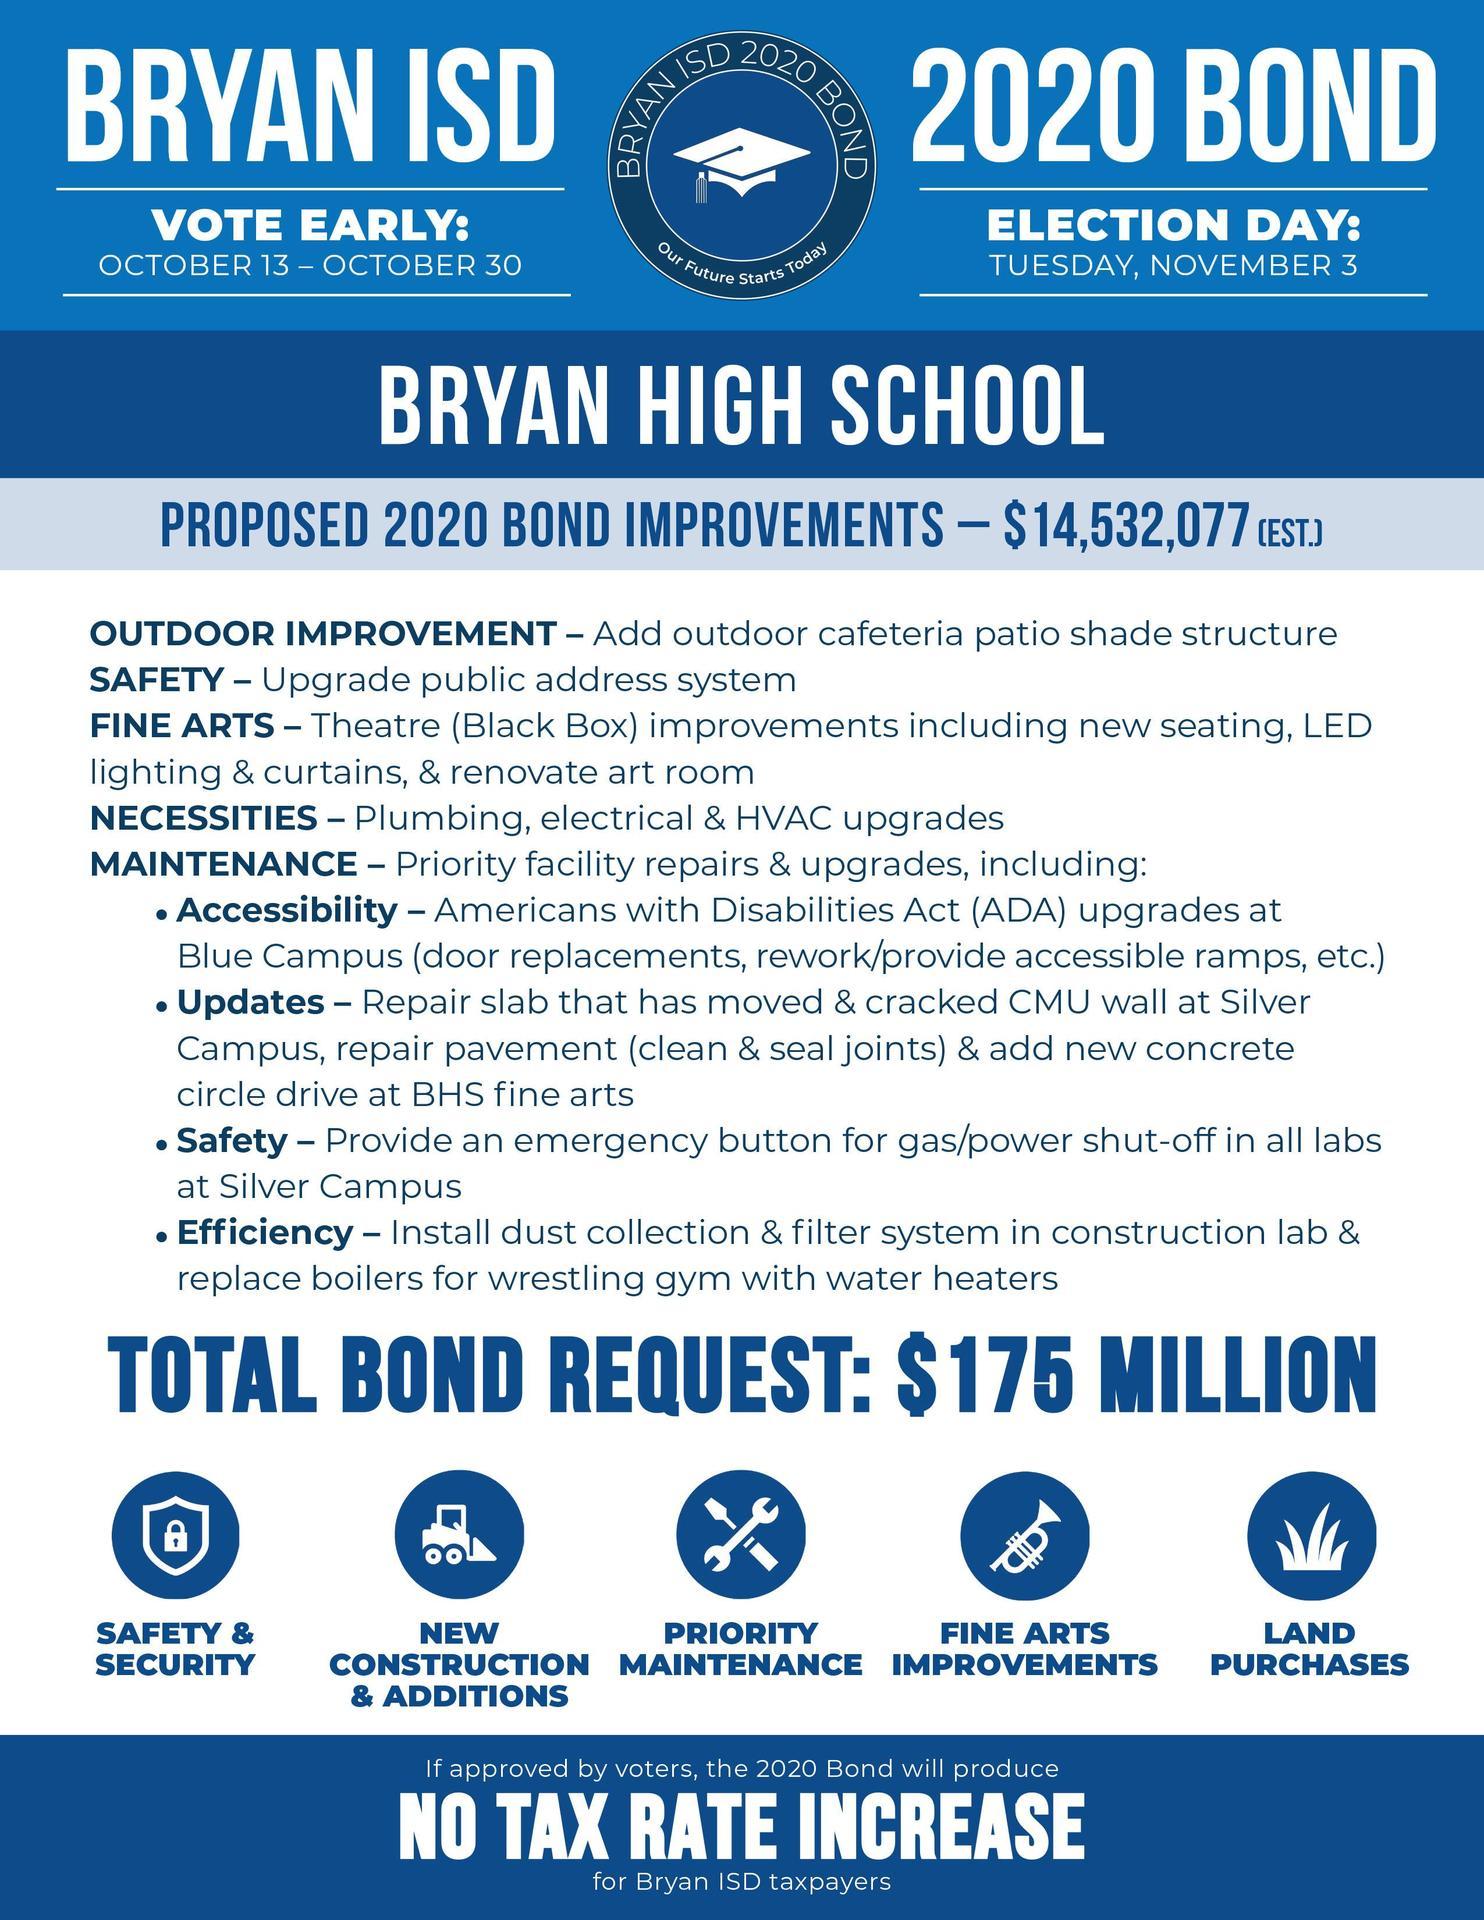 Bryan High School Bond Information